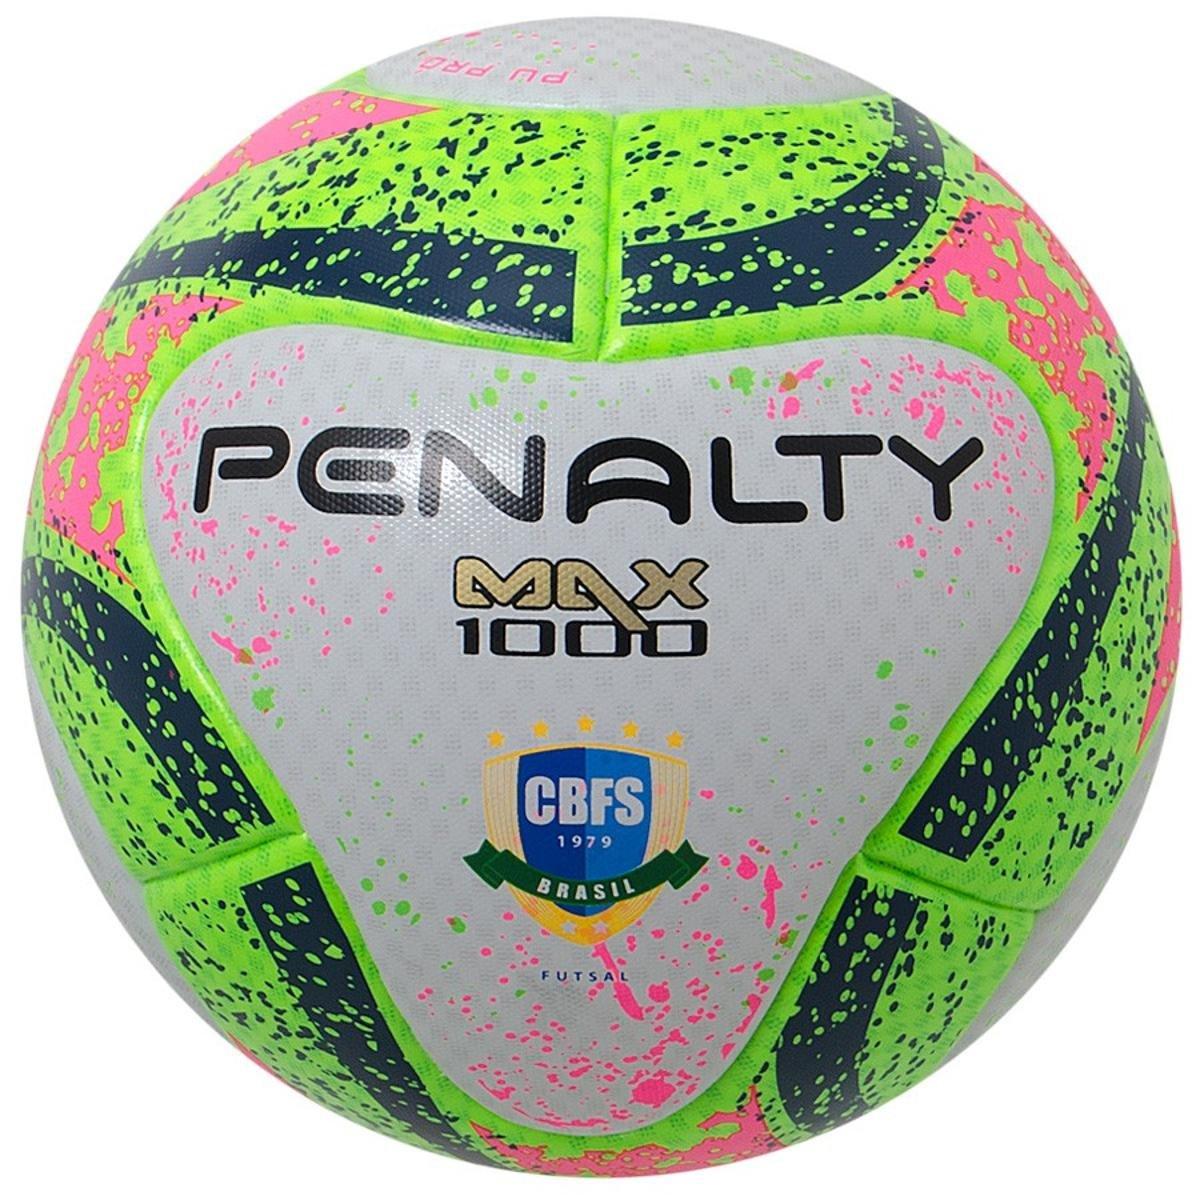 Bola Penalty Futsal Max 1000 Termotec Vii - Compre Agora  7ab06d2c778ff